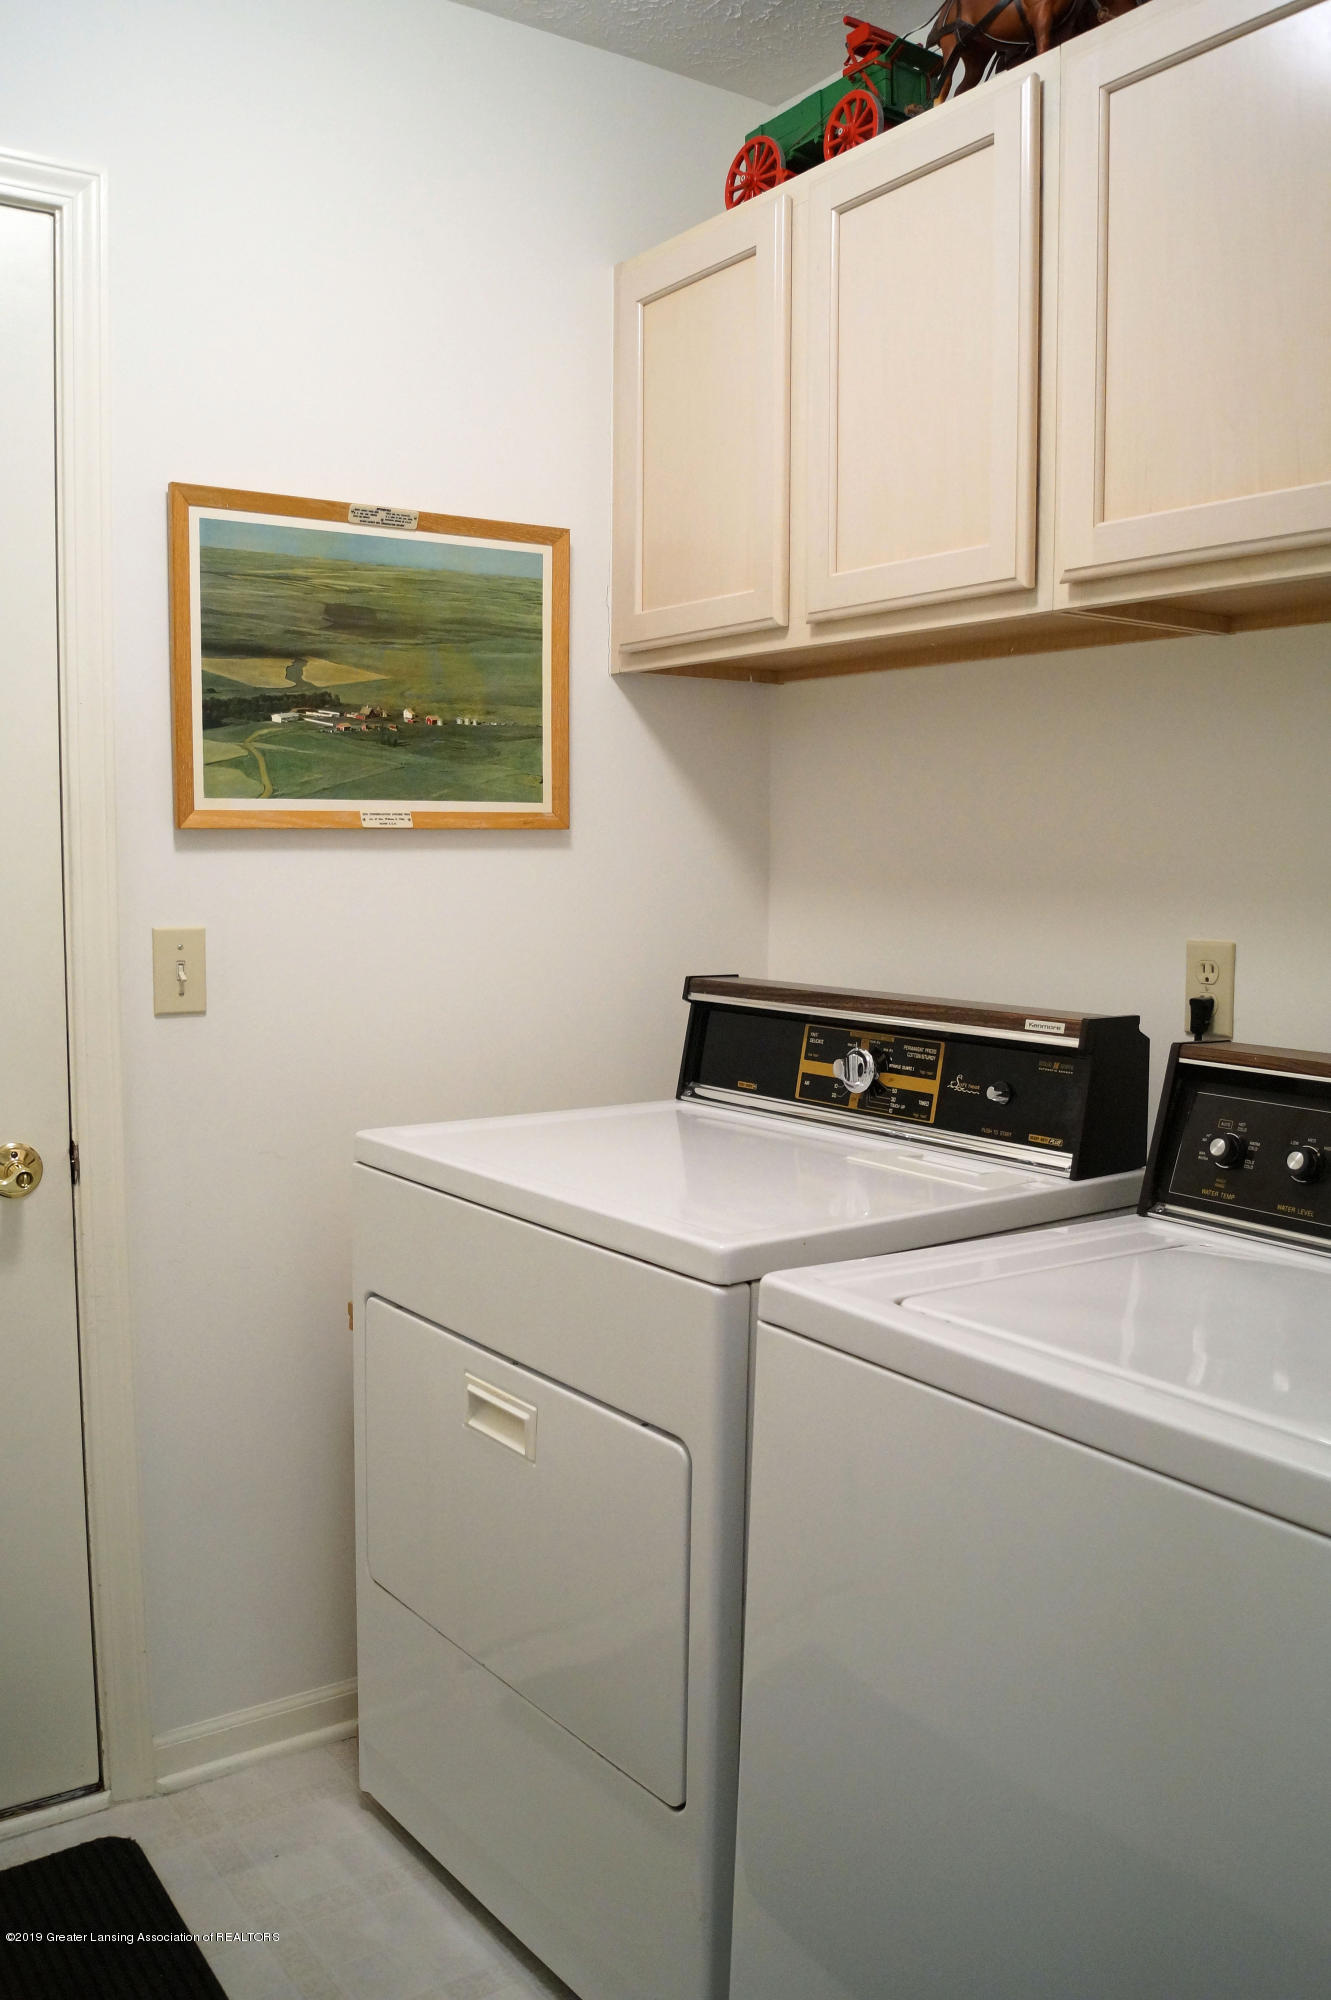 13564 Hunters Crossing - Laundry Room - 17